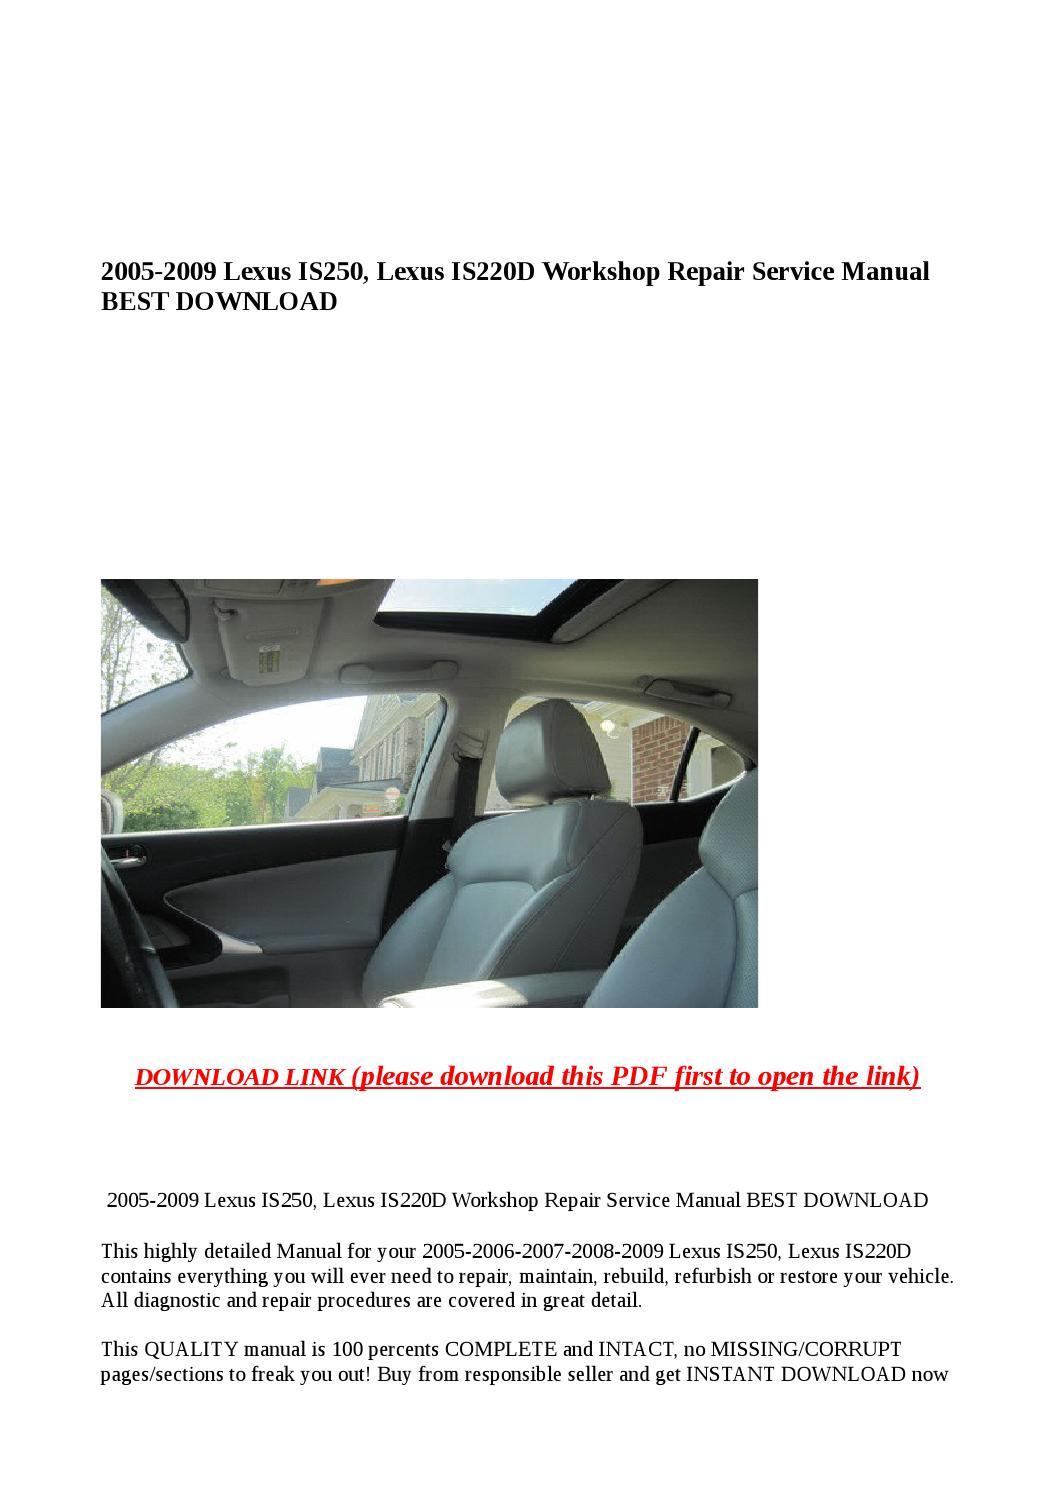 2007 lexus is 250 service manual pdf